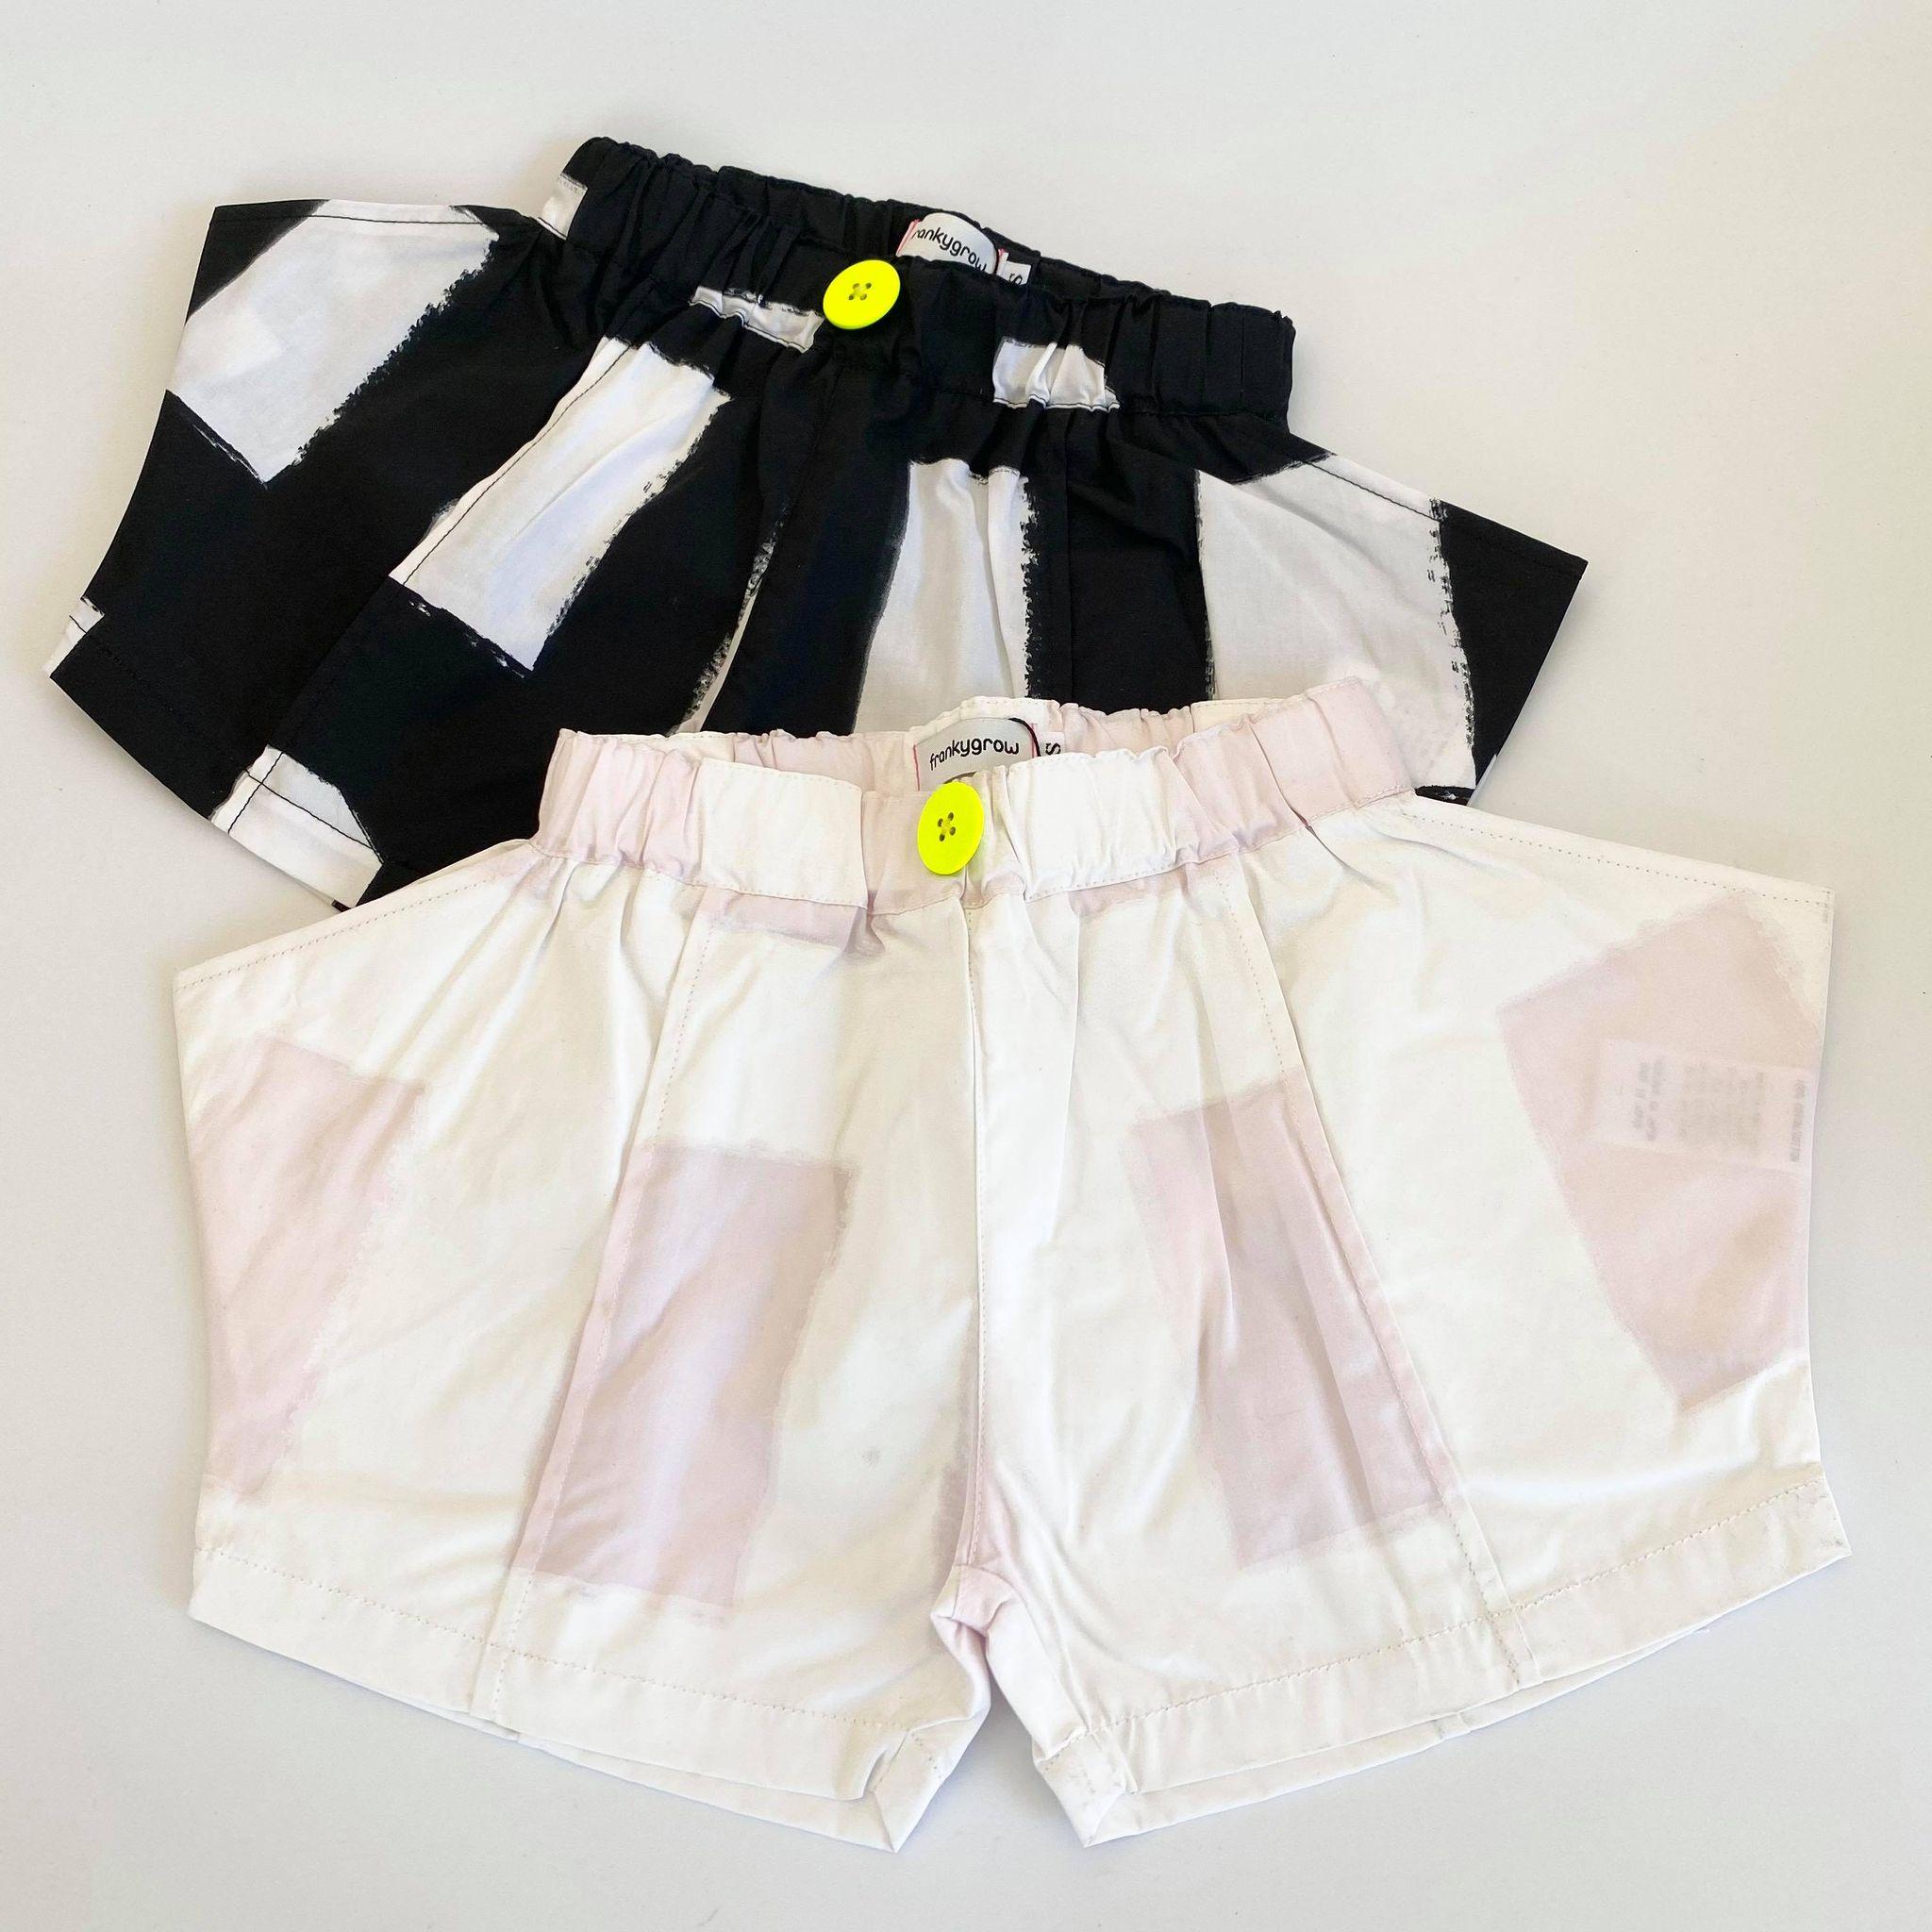 【frankygrow】21SBT-236 ORIG. CHECK RHOMBOS SHORT PANTS